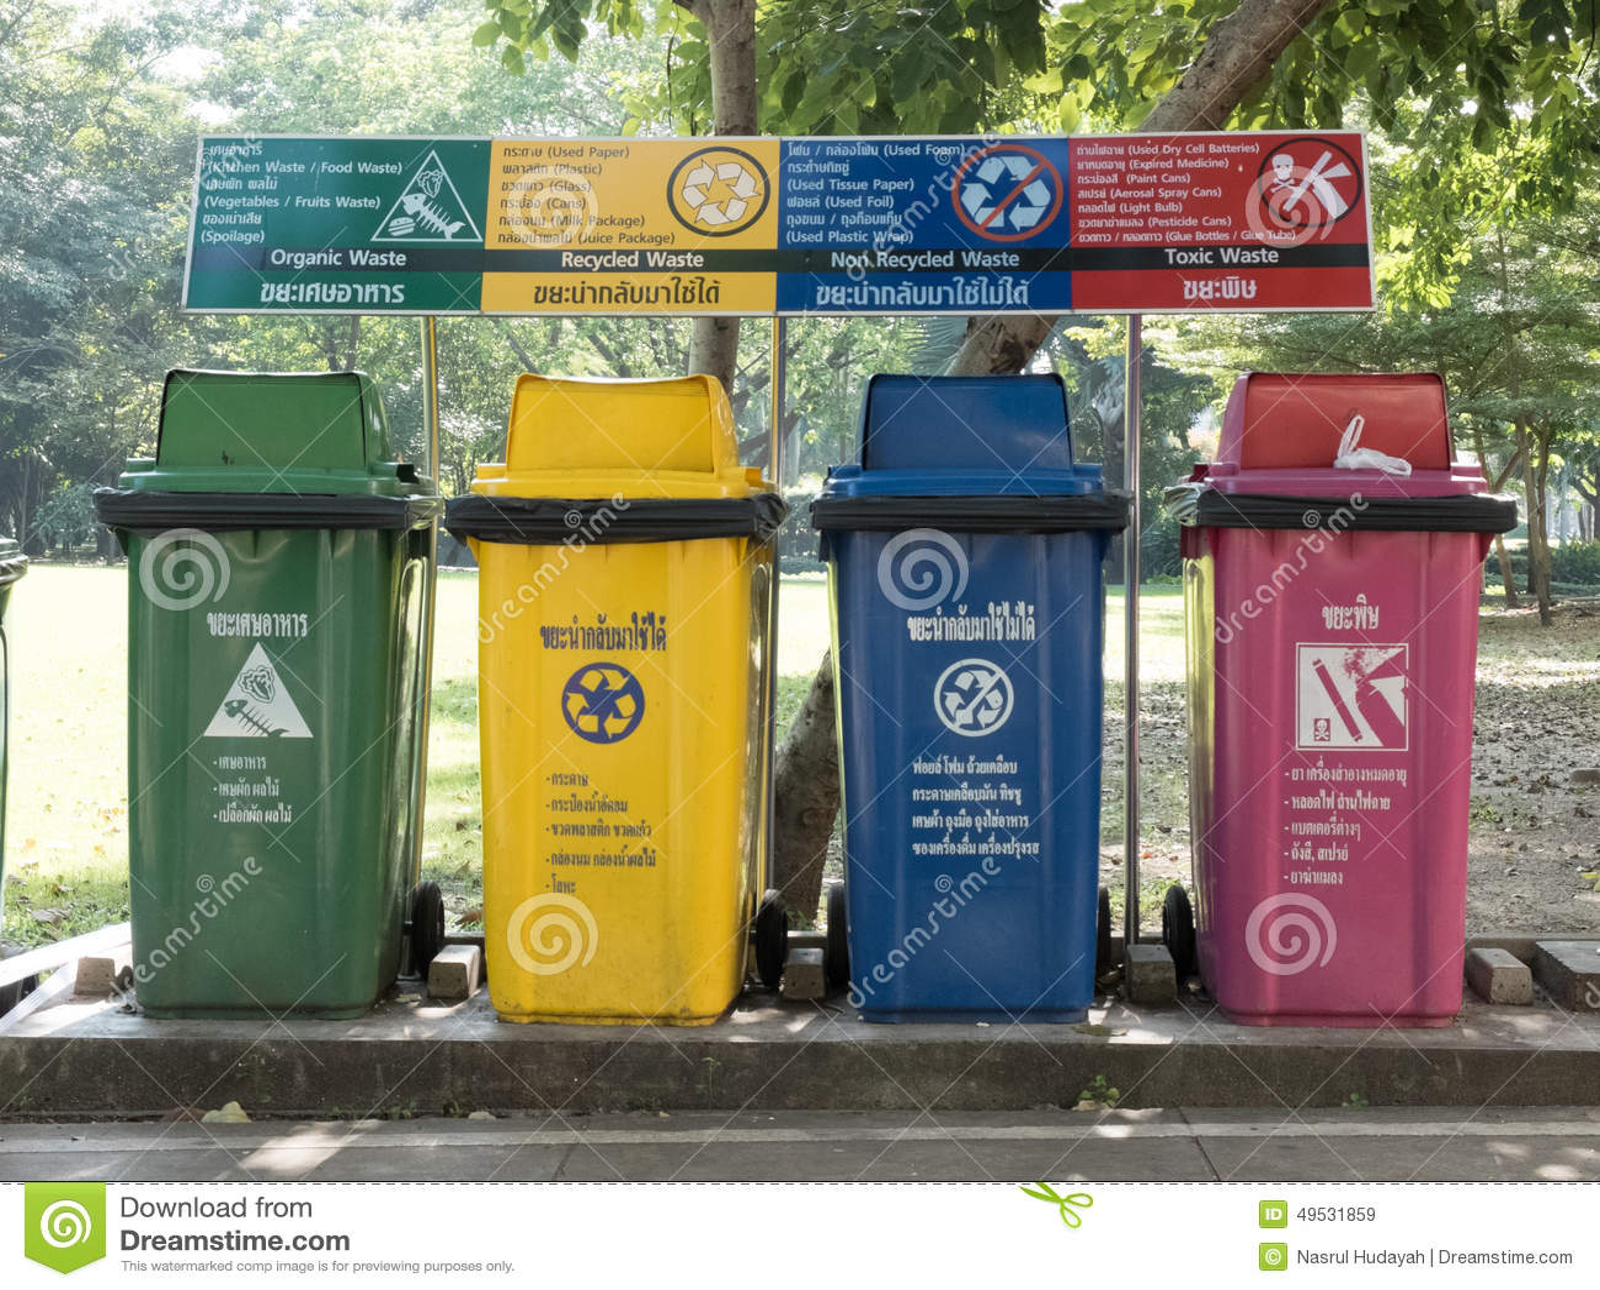 green non recycled toxic trash waste bin